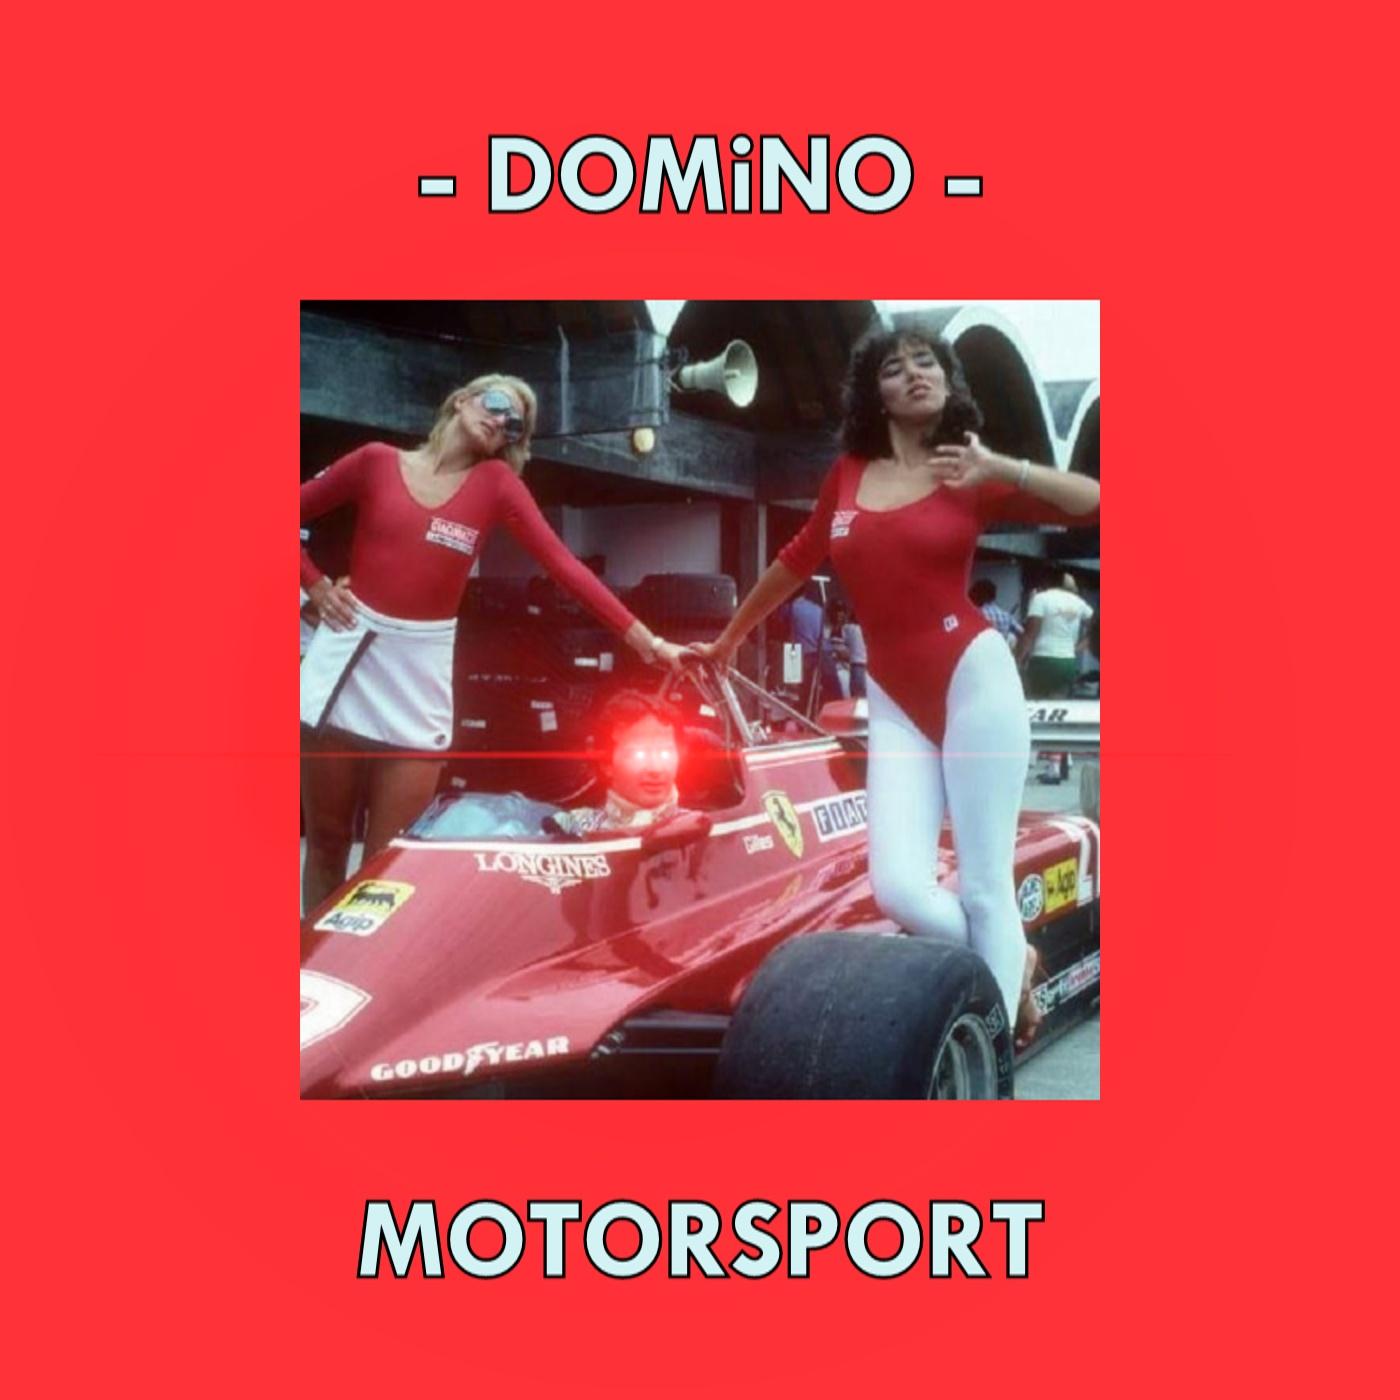 Upcoming: Domino - Motorsport [Full EP]